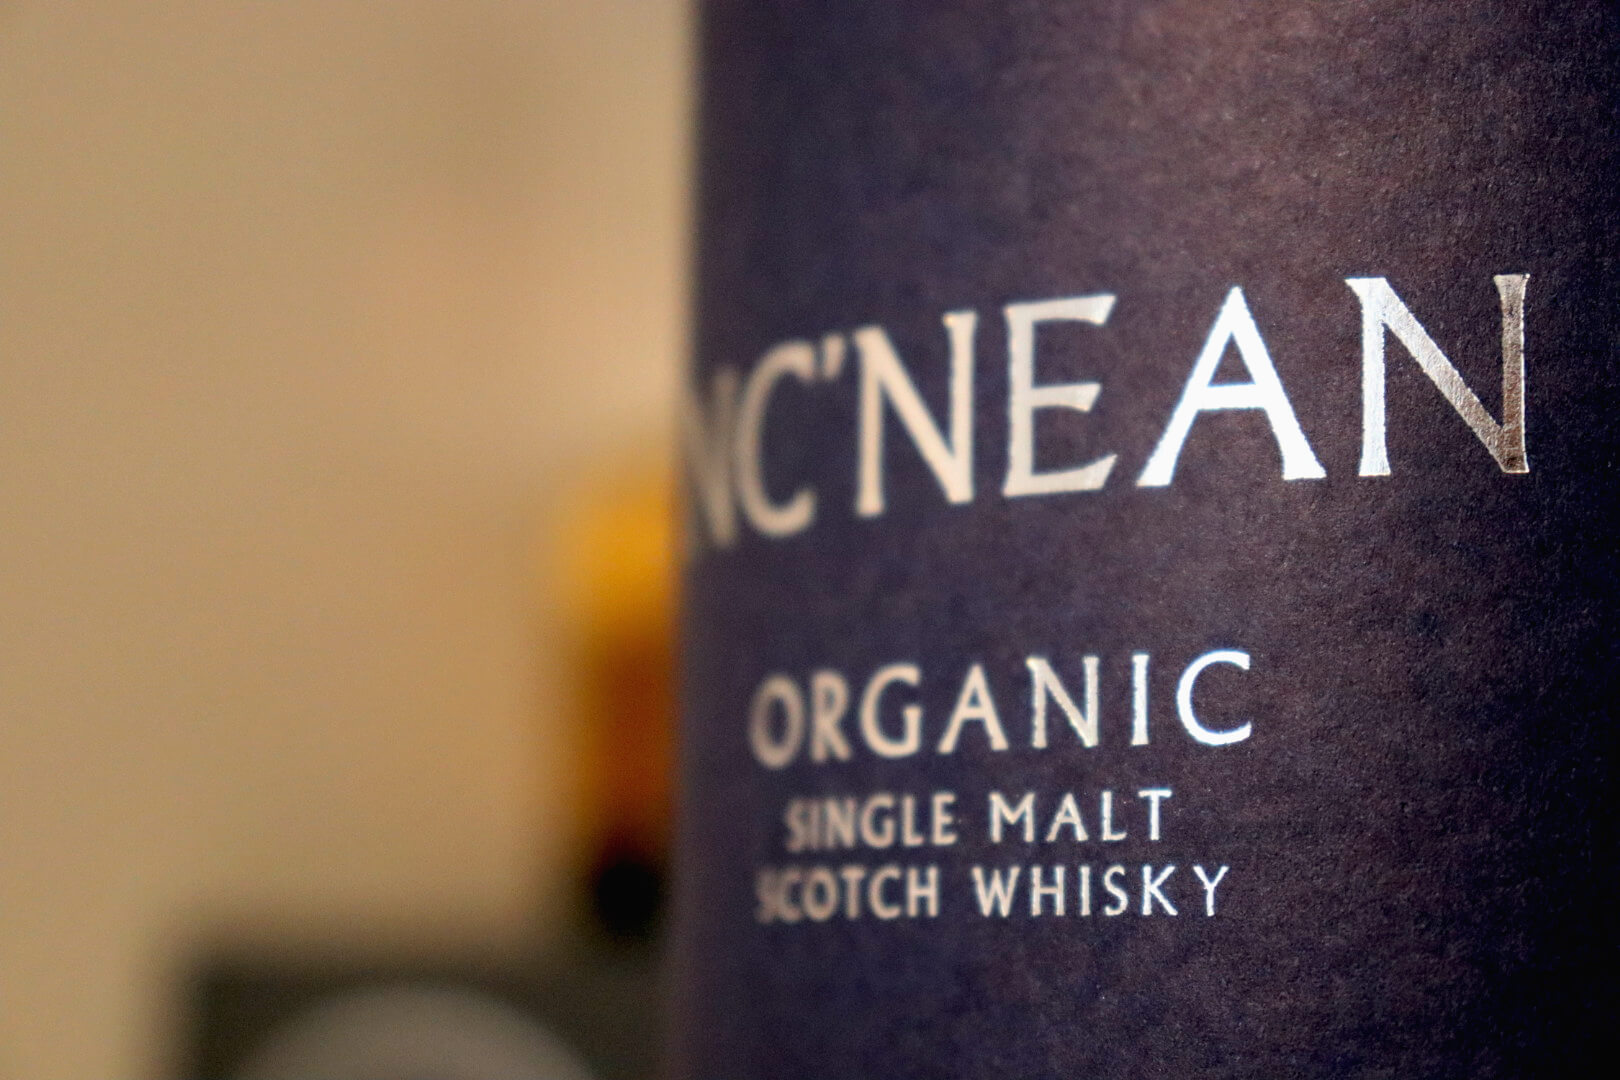 Whiskybesprechung #199: Nc'Nean - Organic Batch 05